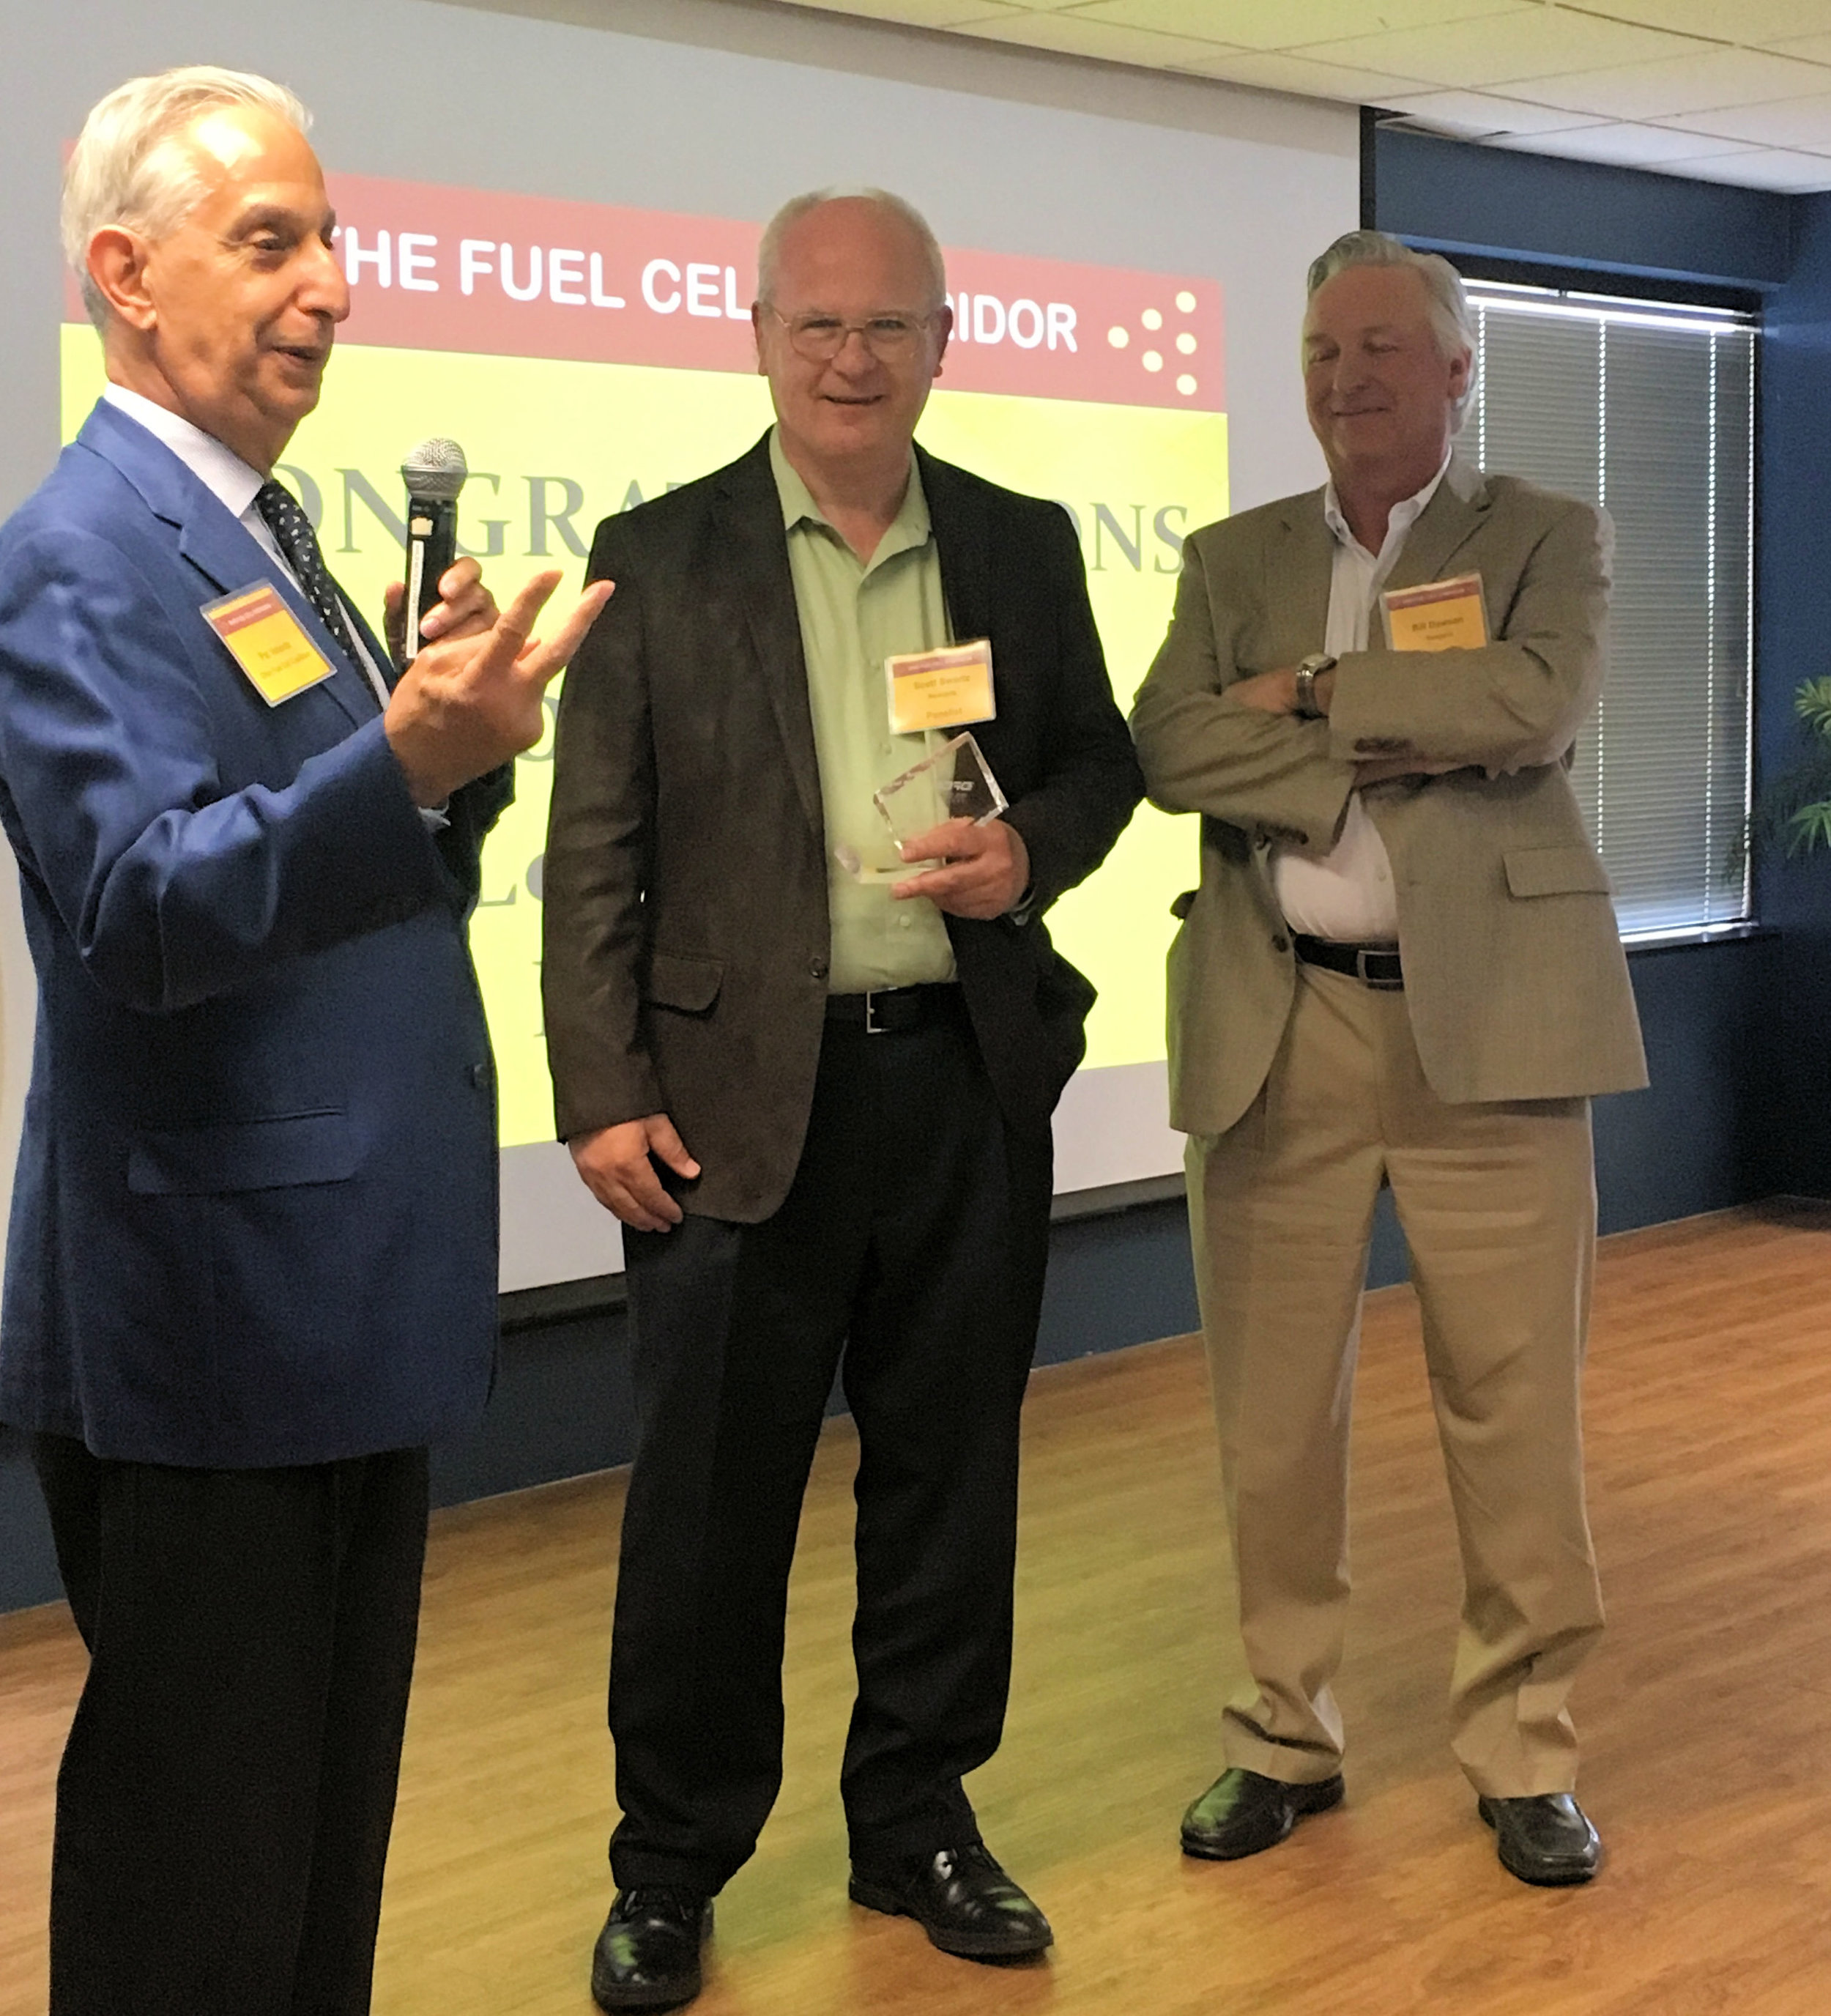 Dr. Scott Swartz Leadership Award w/P. Valente & W. Dawson